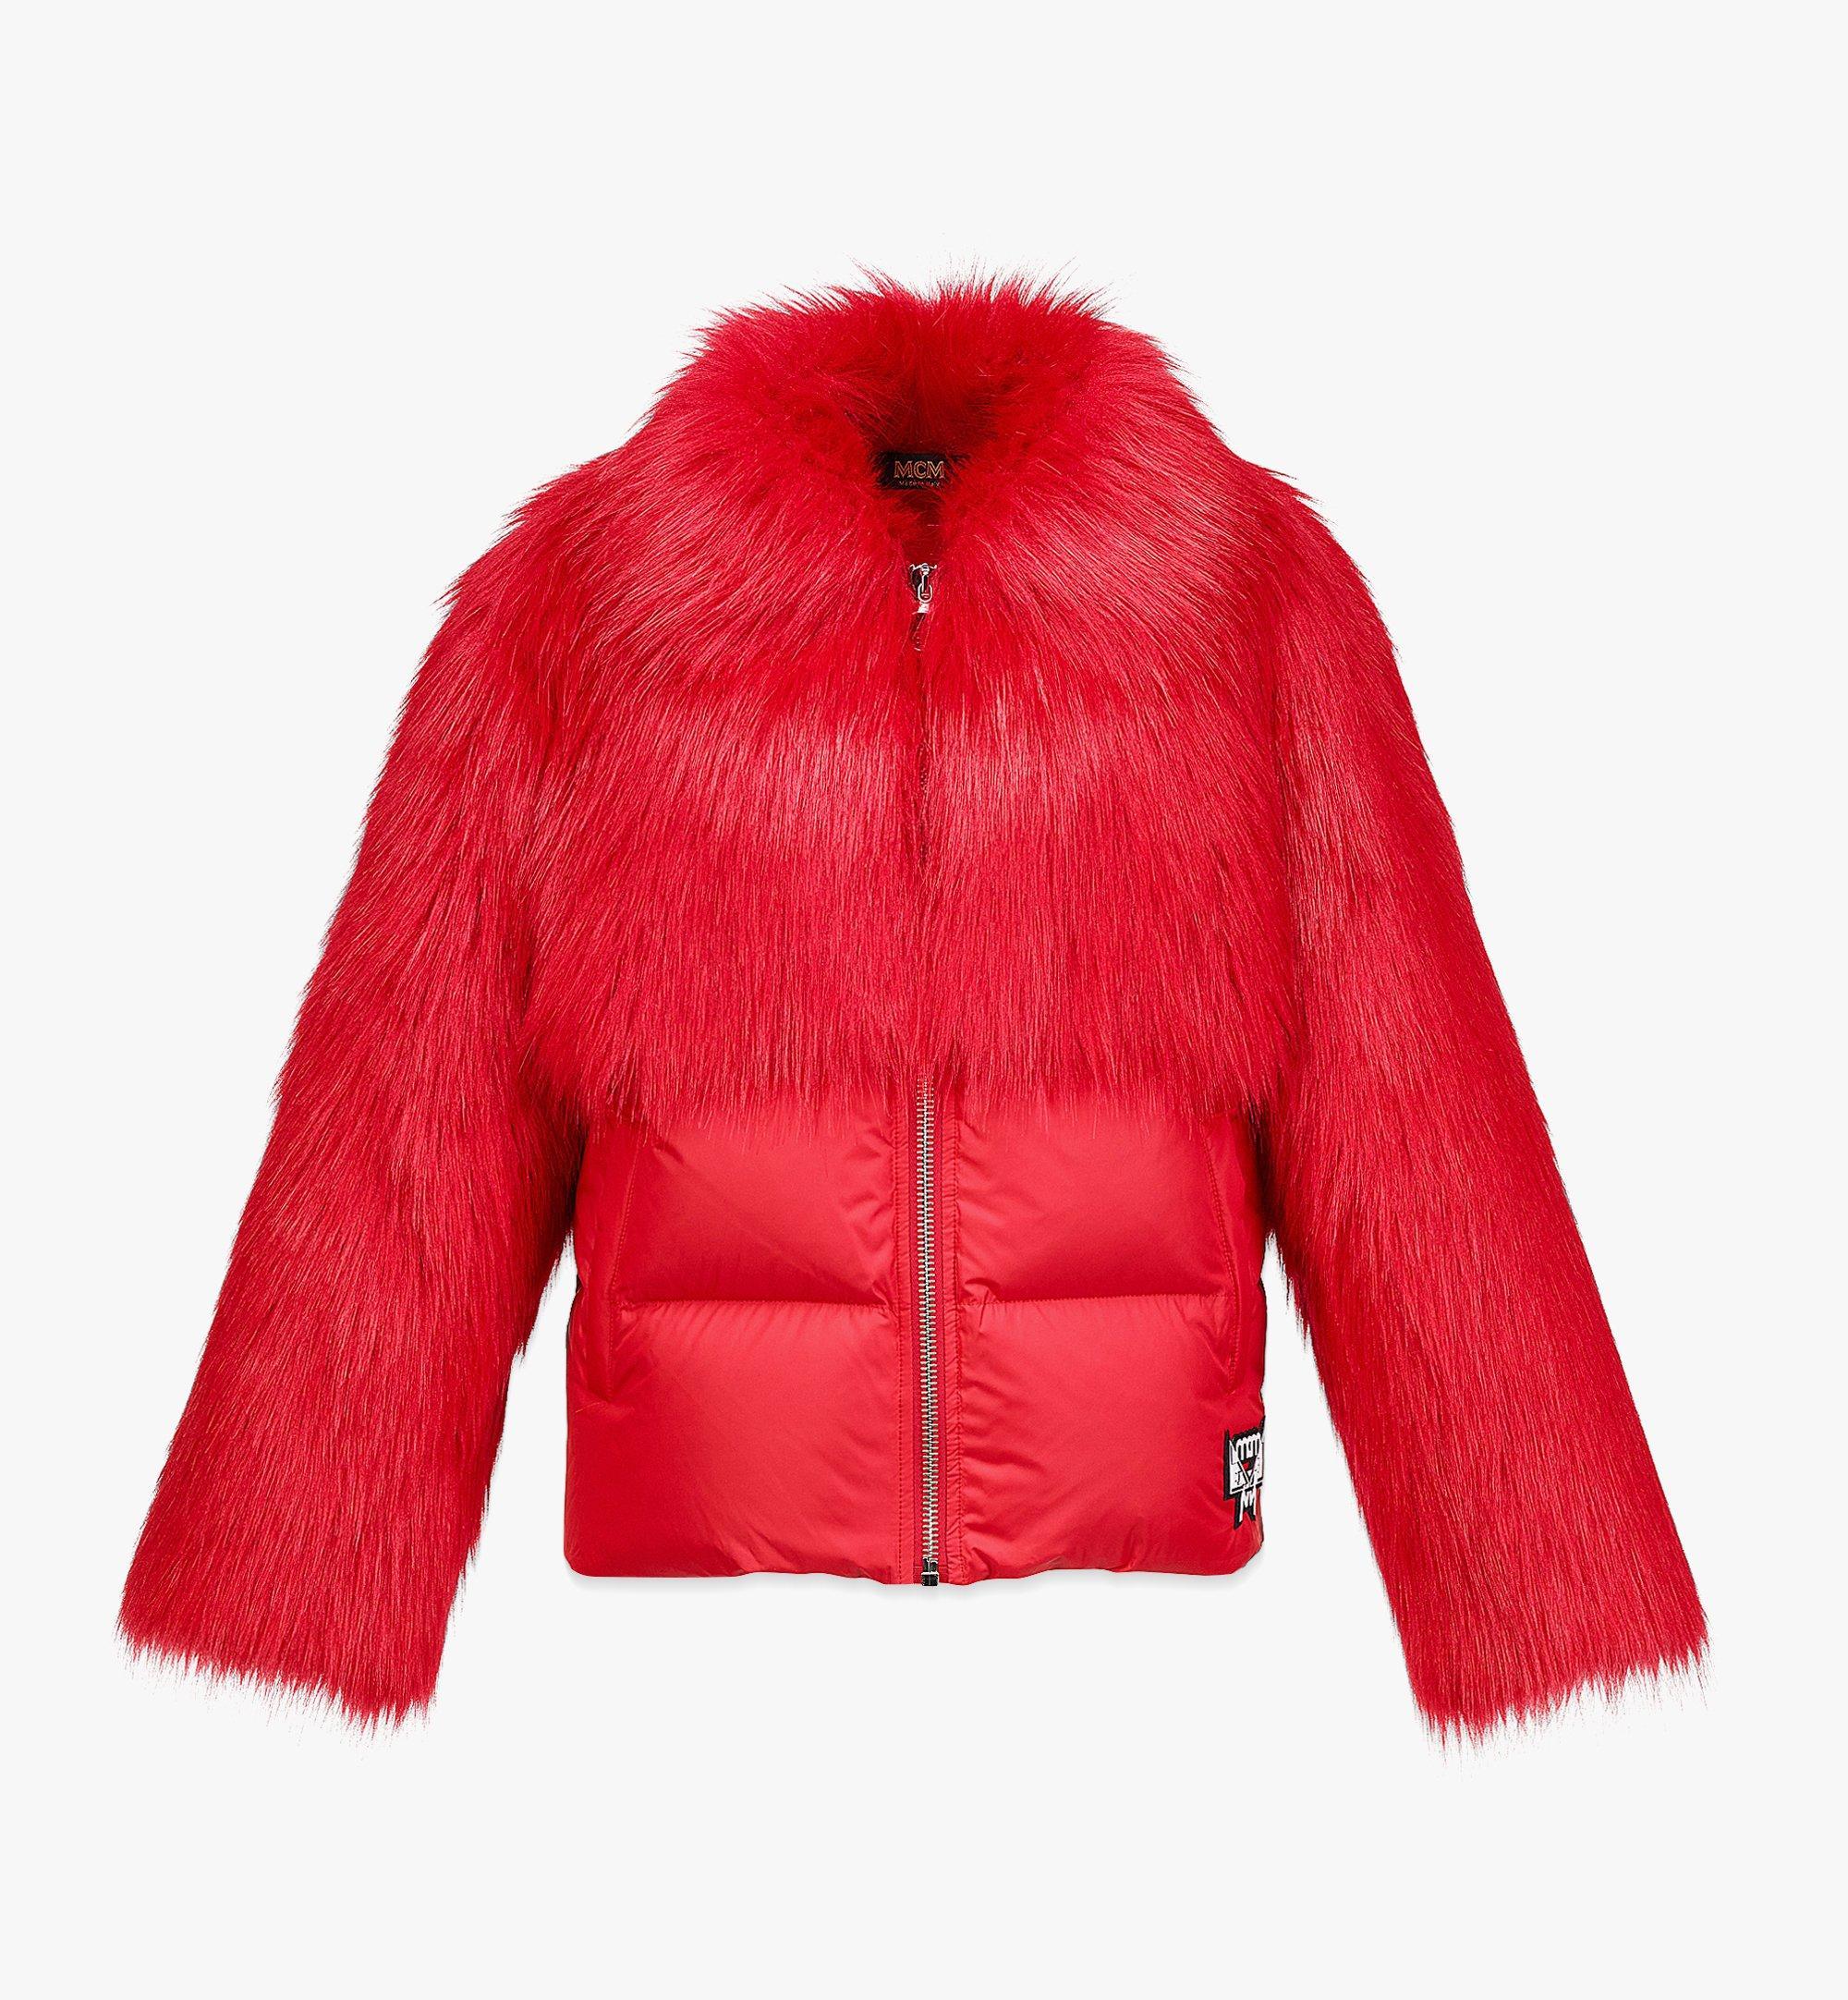 MCM Women's Faux Fur Puffer Jacket Red MFCBAMM02R0038 Alternate View 1